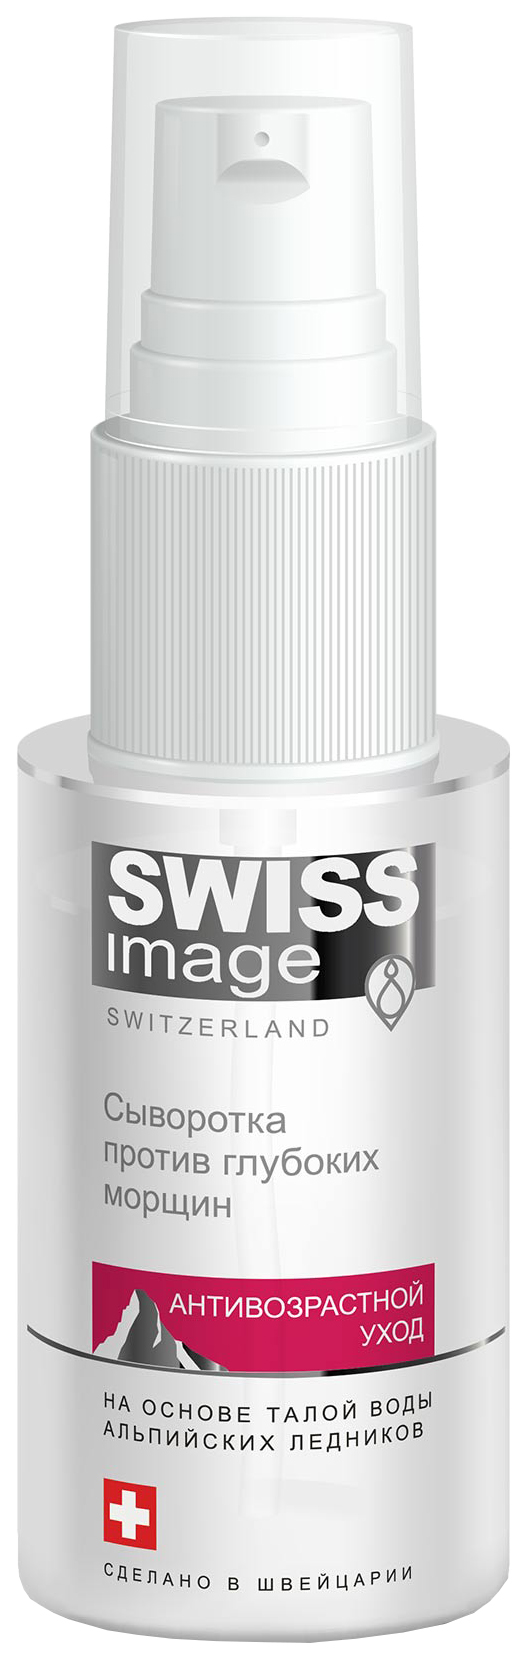 Сыворотка для лица SWISS image АНТИВОЗРАСТНОЙ УХОД Против глубоких морщин 30 мл фото